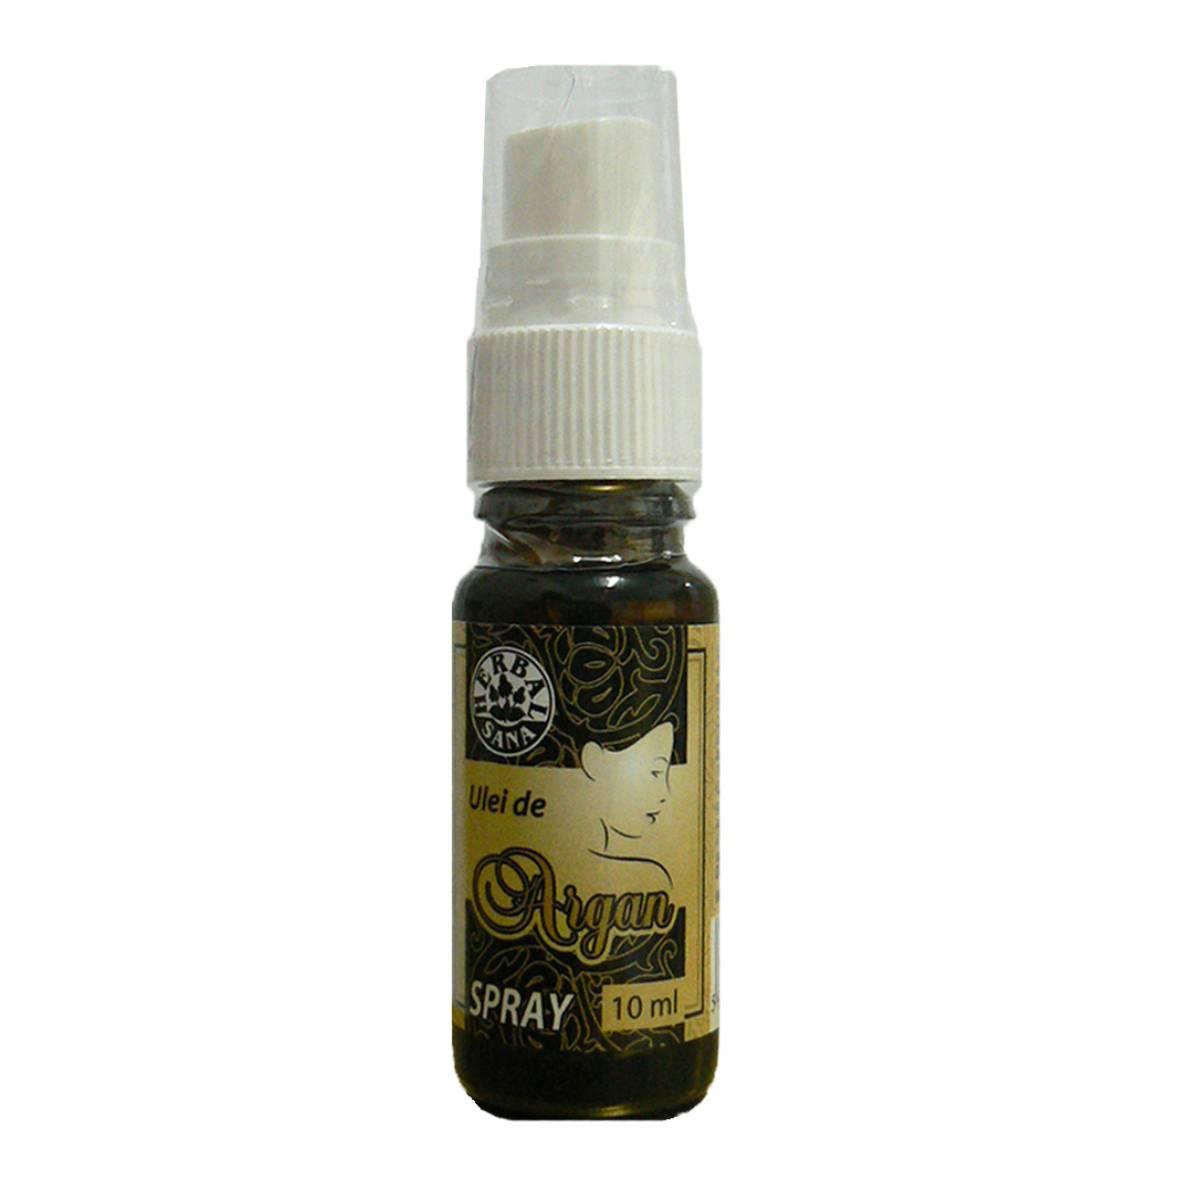 Ulei de Argan presat la rece spray, 10 ml, Herbavit